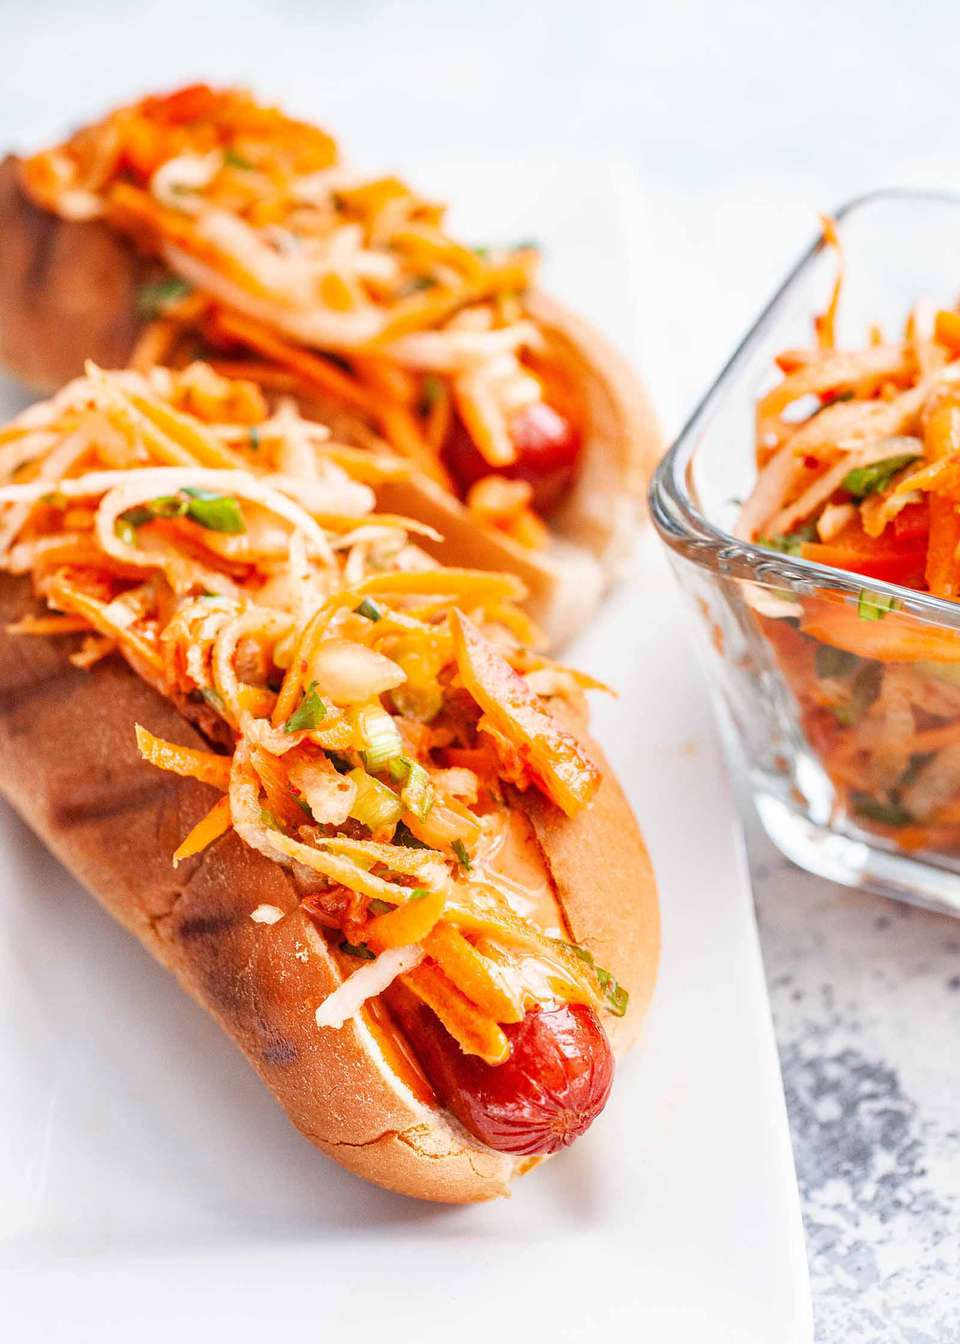 Grilled Hot Dog Recipe with Kimchi Slaw